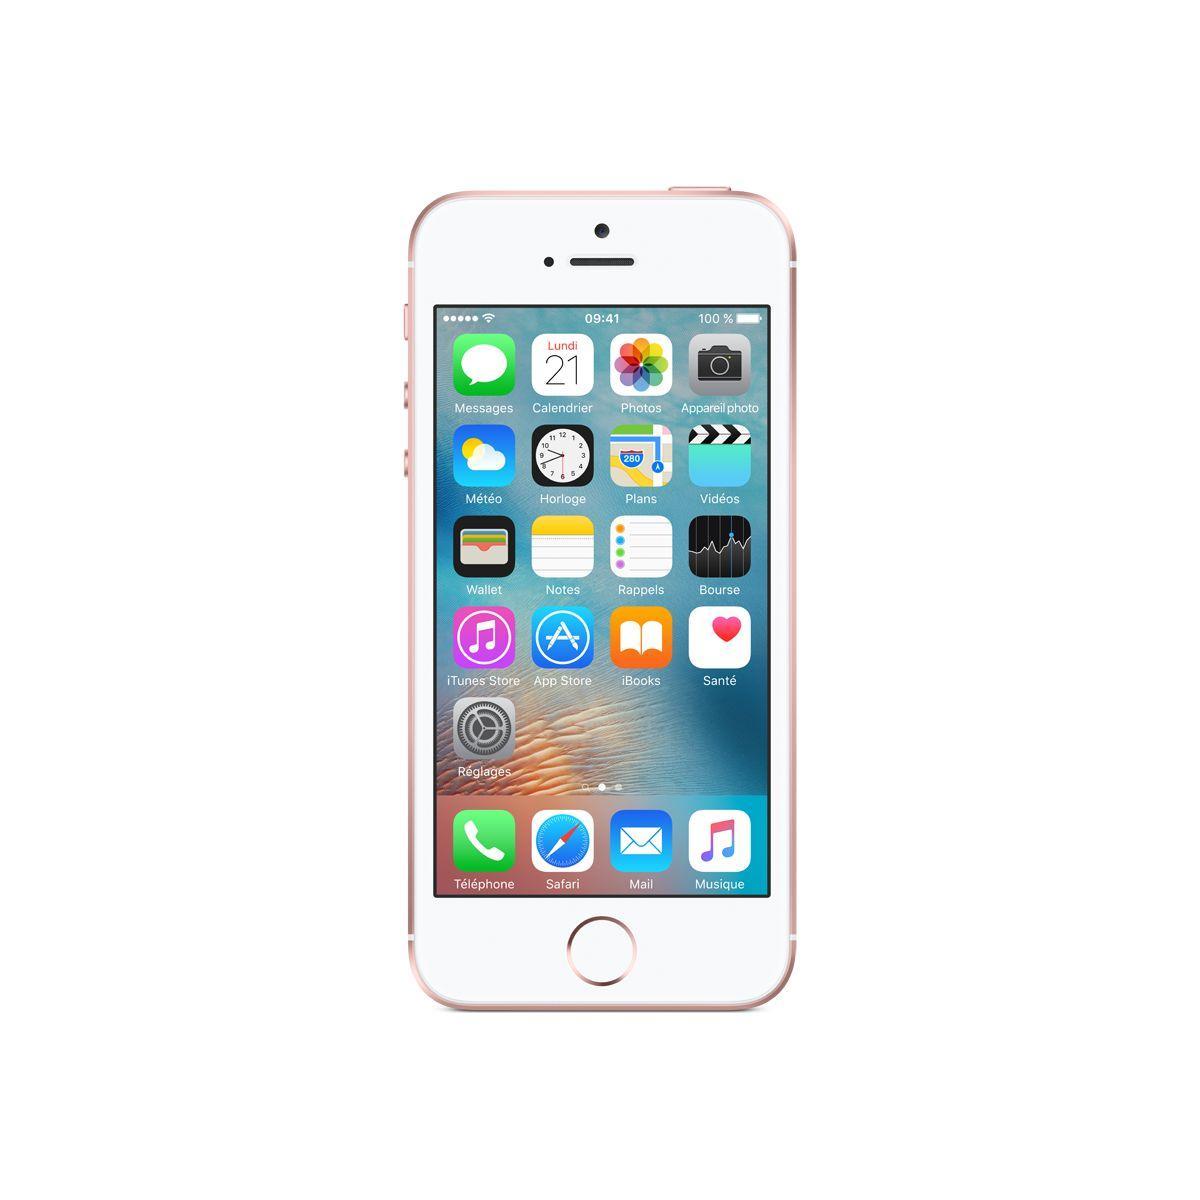 Smartphone apple iphone se 128go rose gold - livraison offerte : code livrelais